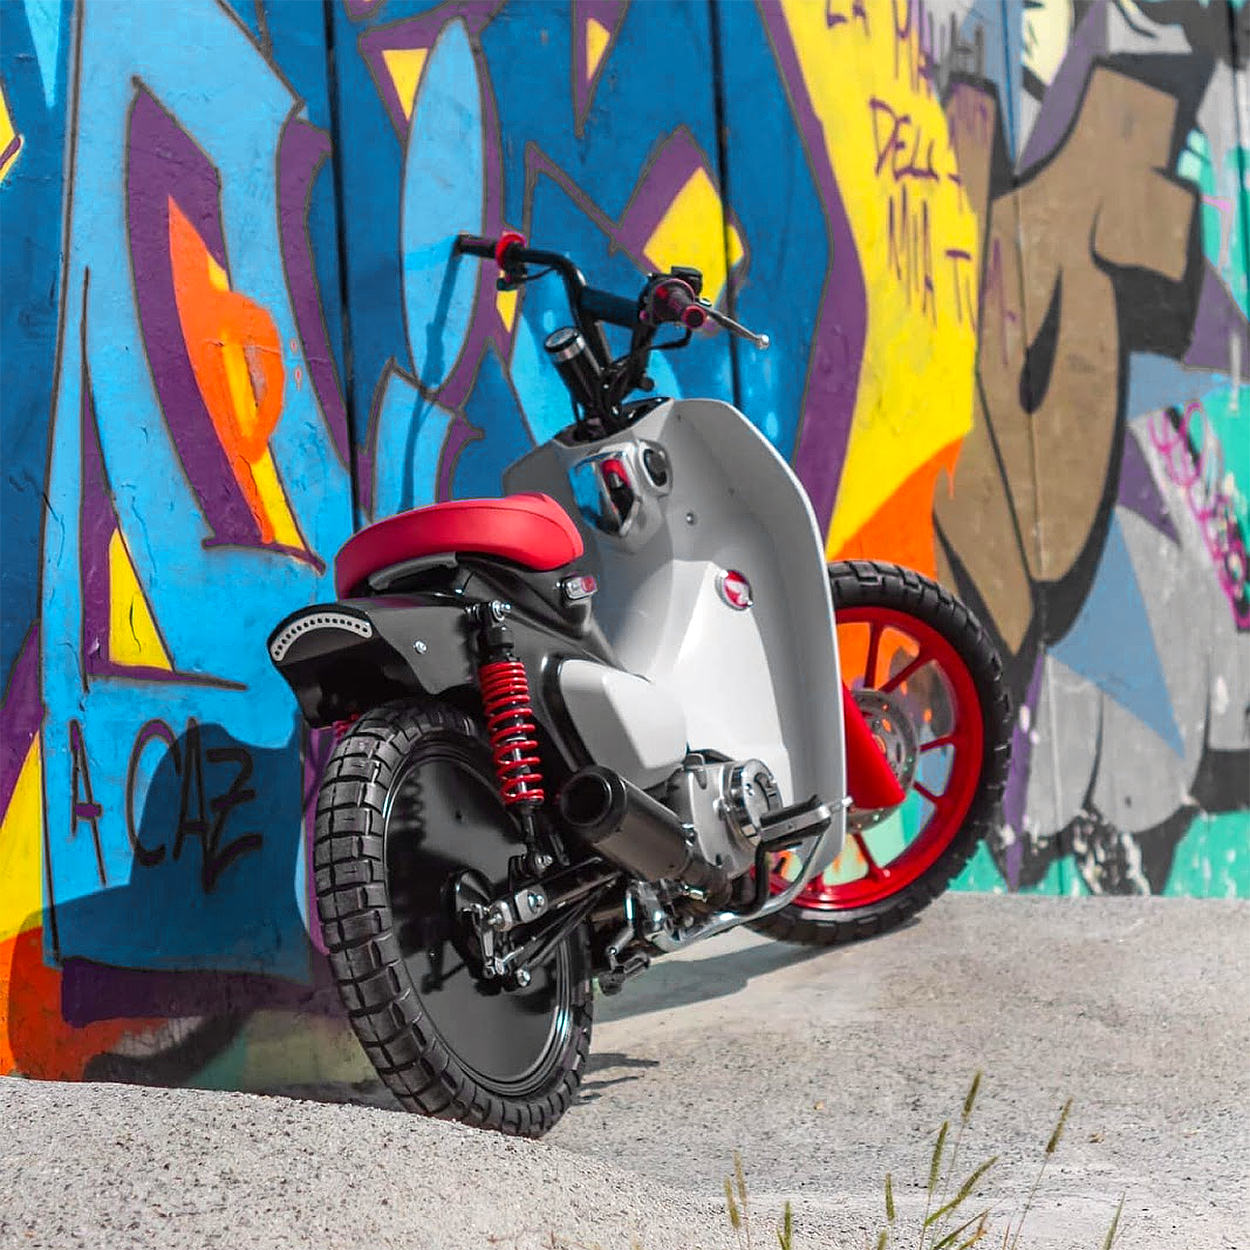 Custom Honda Super Cub by Greaser Garage